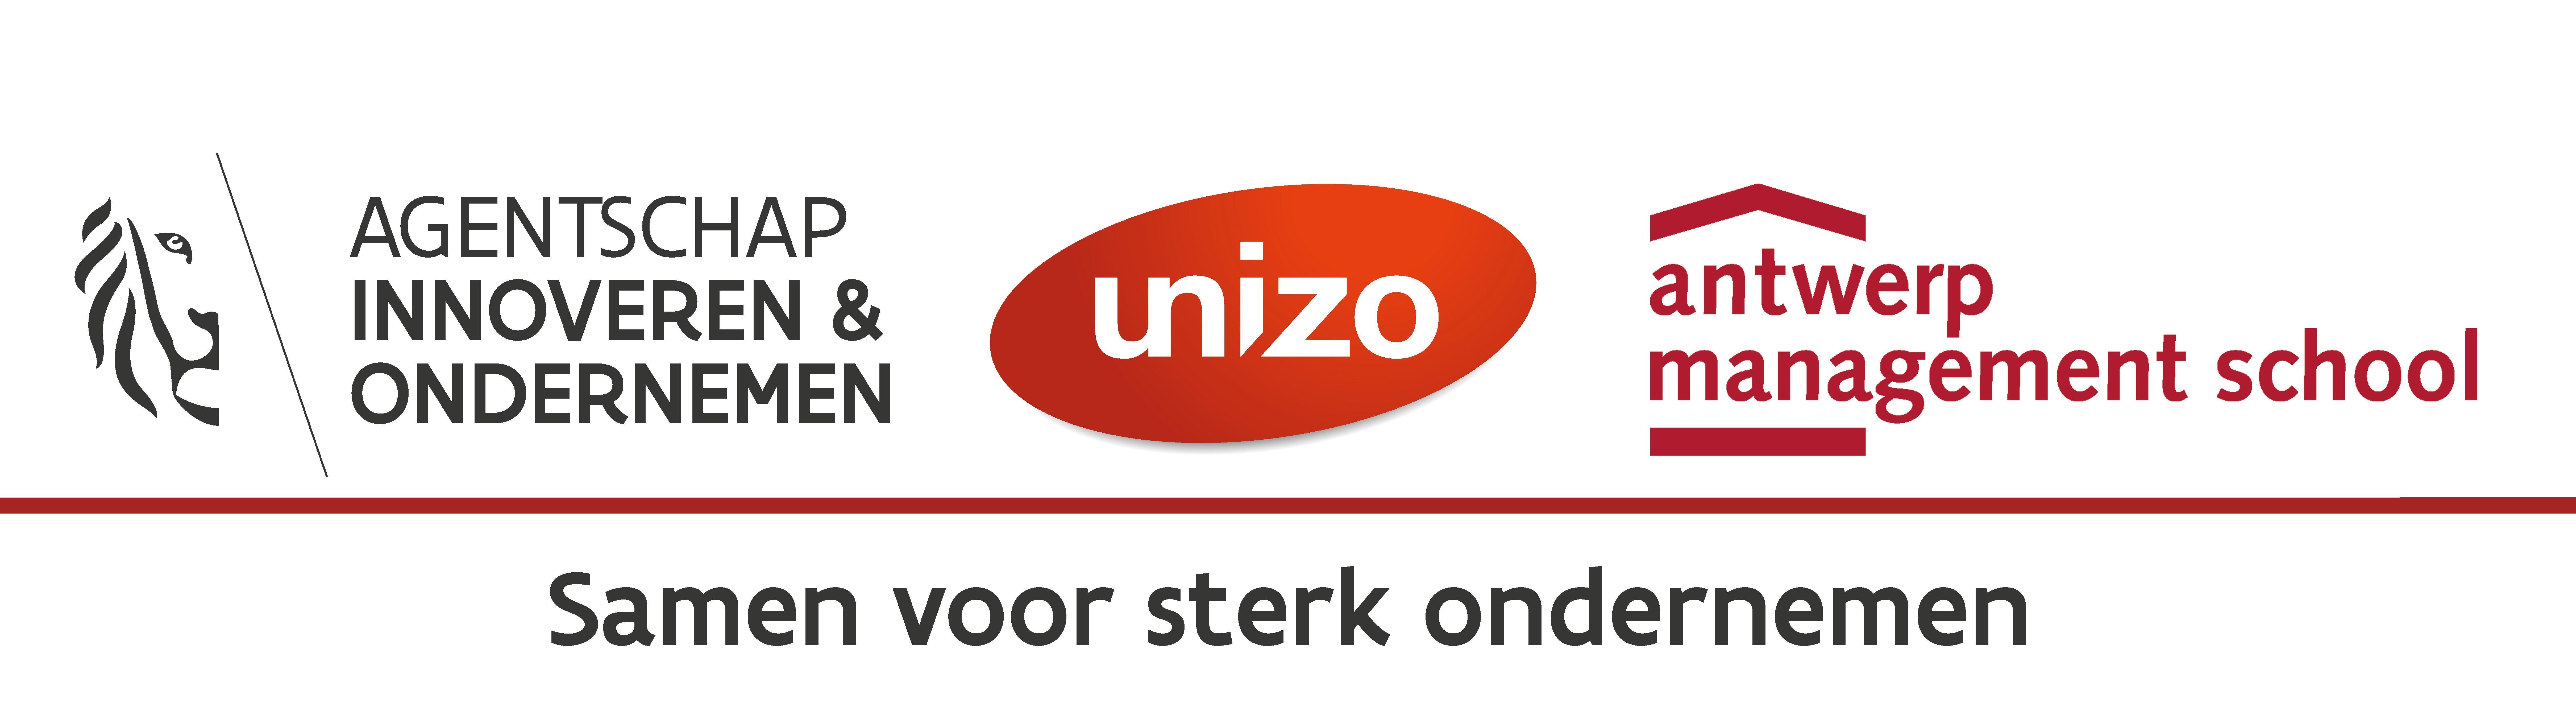 PartnerlogoVLAIO-AMS-Unizo-alternatief